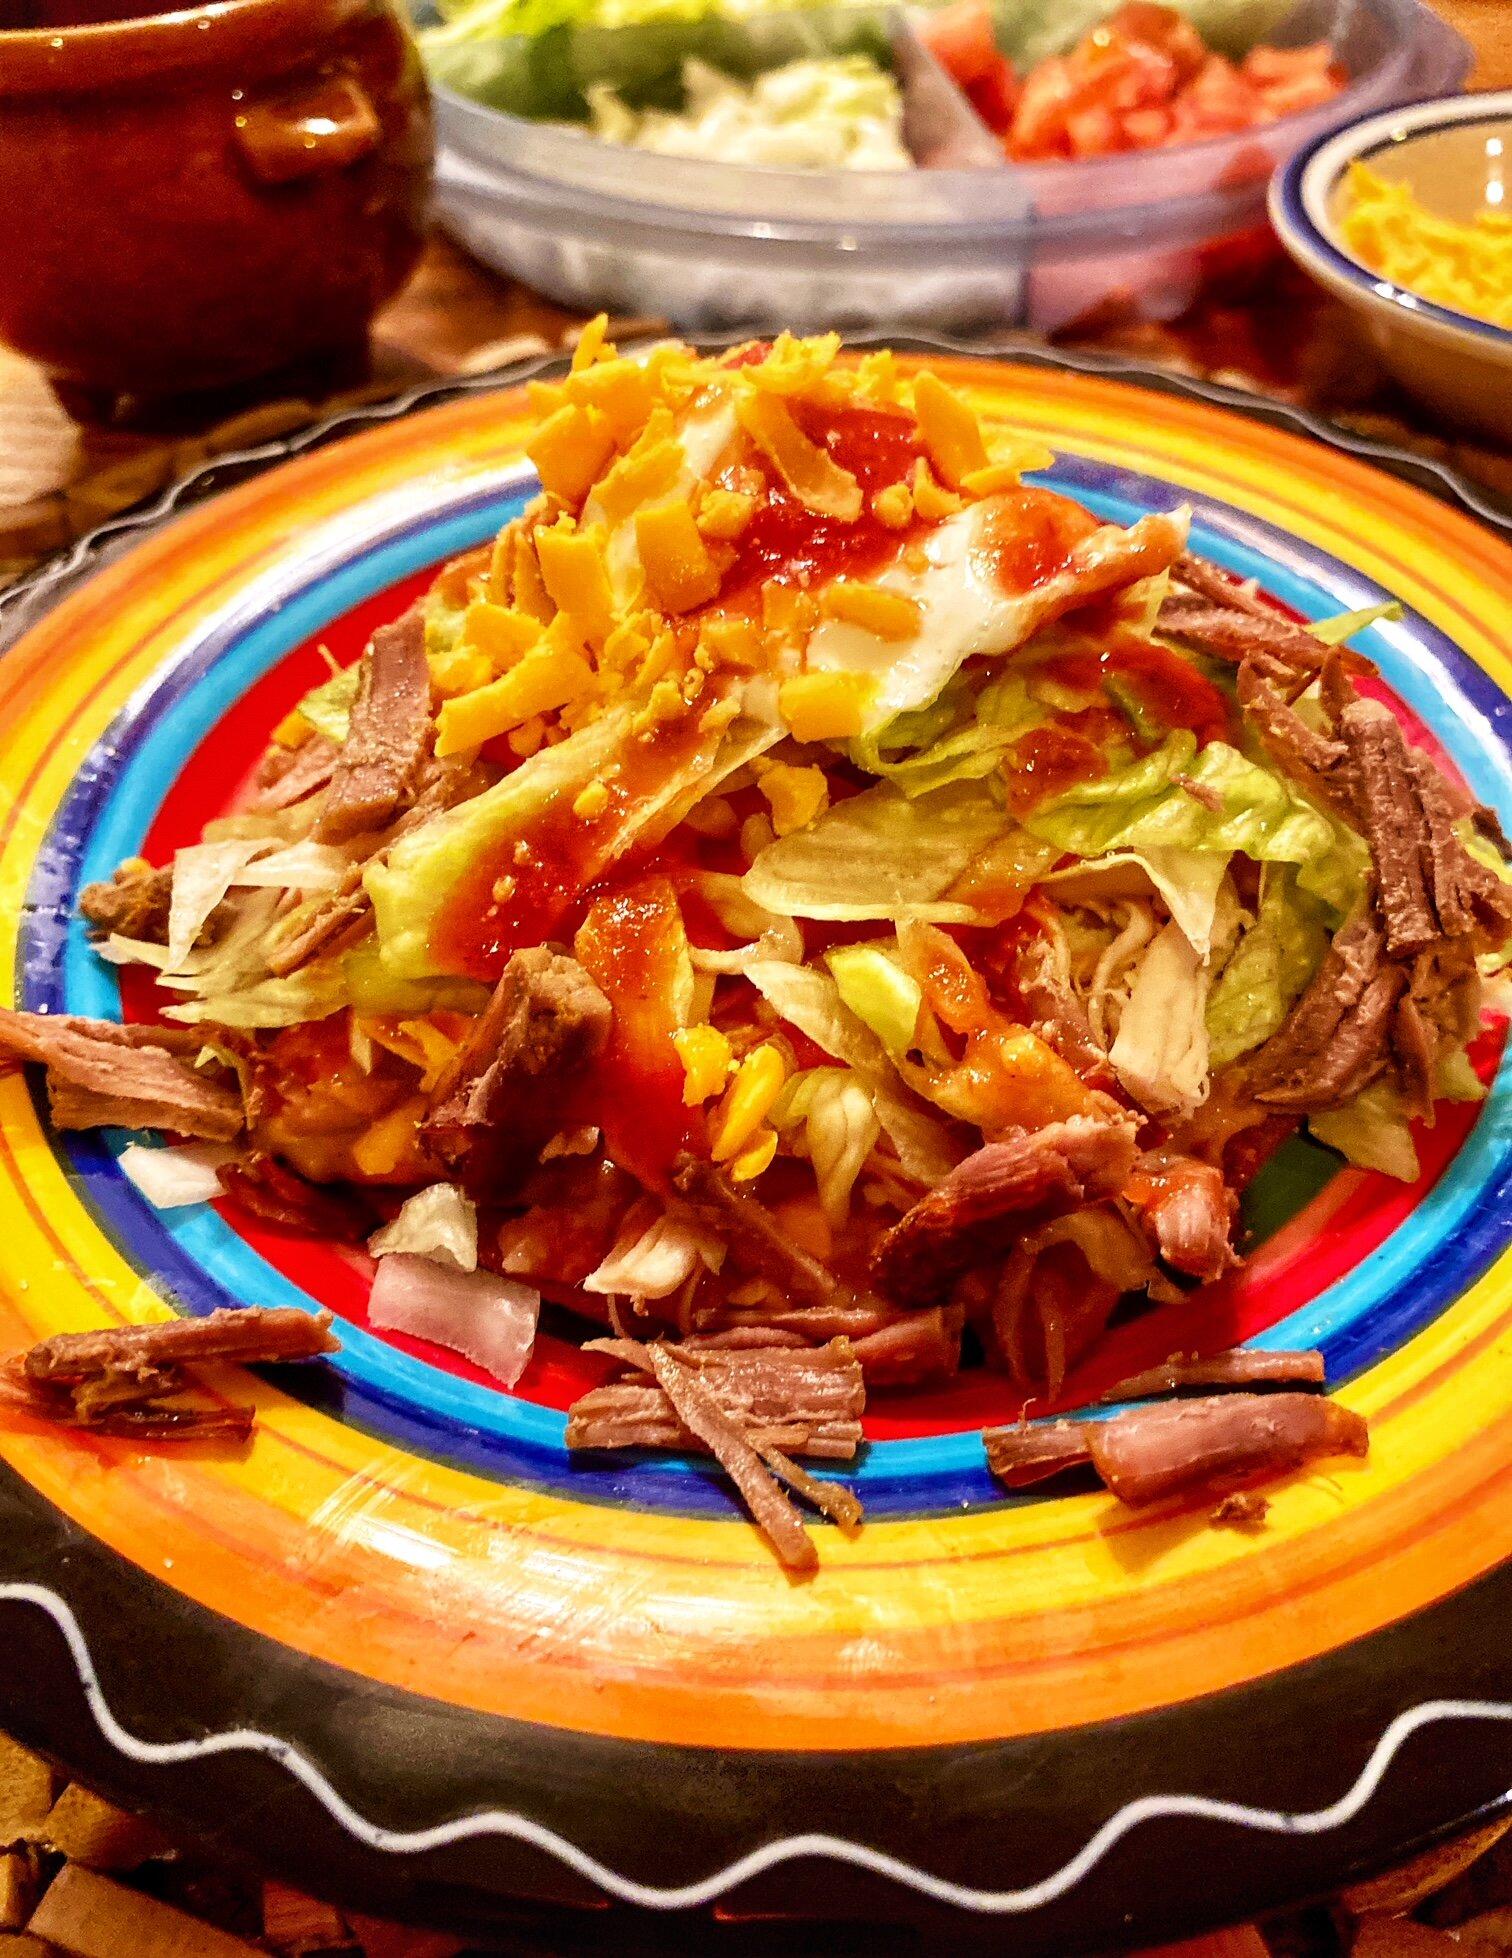 tostadas de salpicon shredded beef